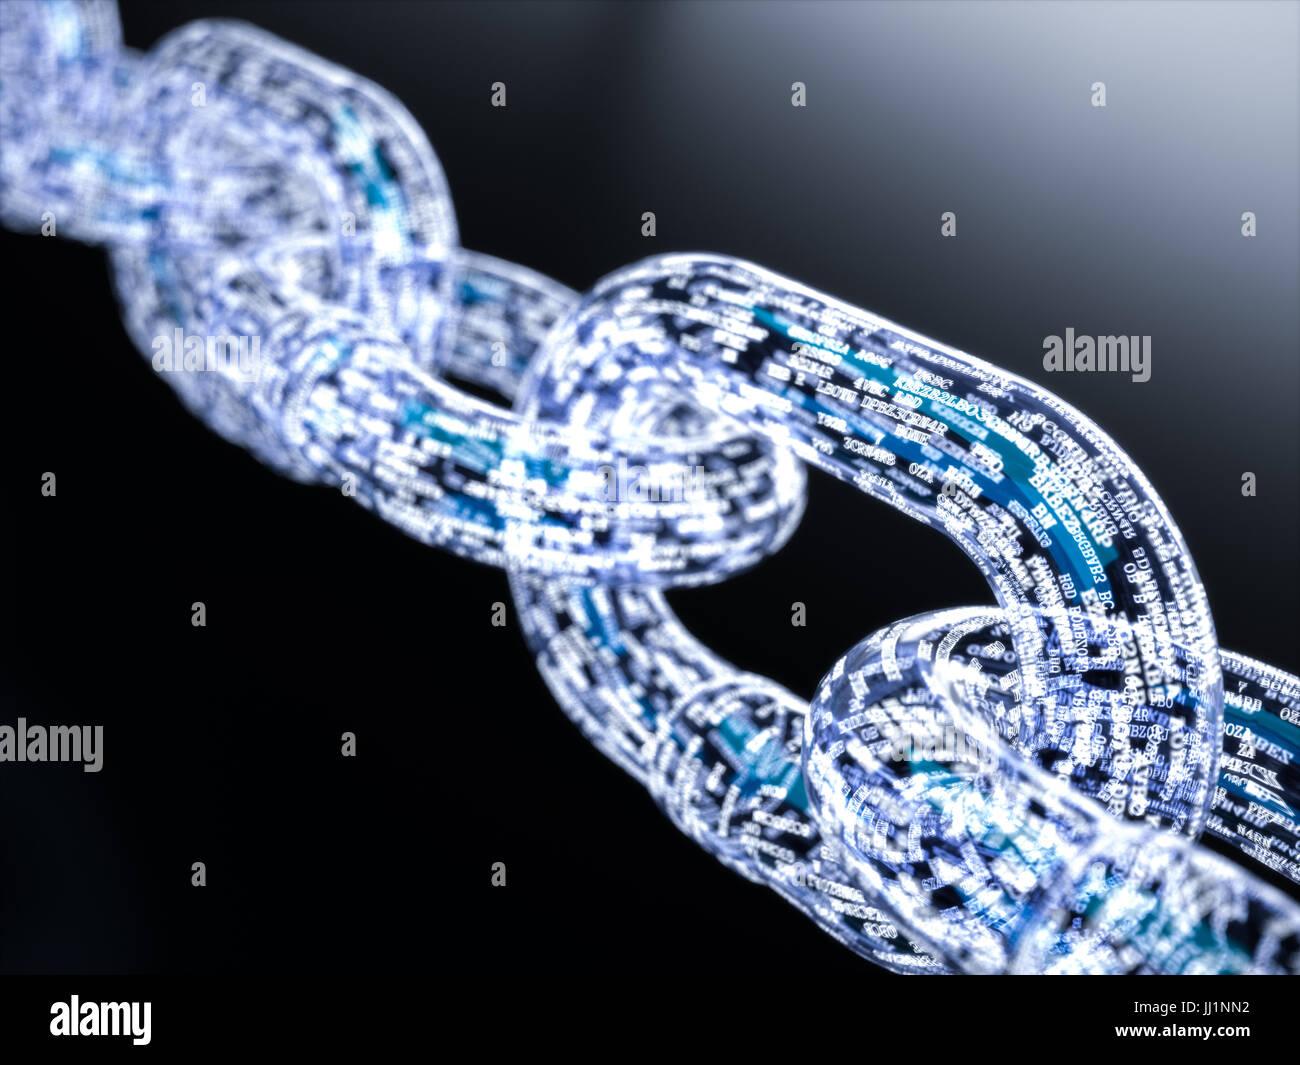 Blockchain digital illuminated shape. Big data node base concept. 3d rendering illustration - Stock Image